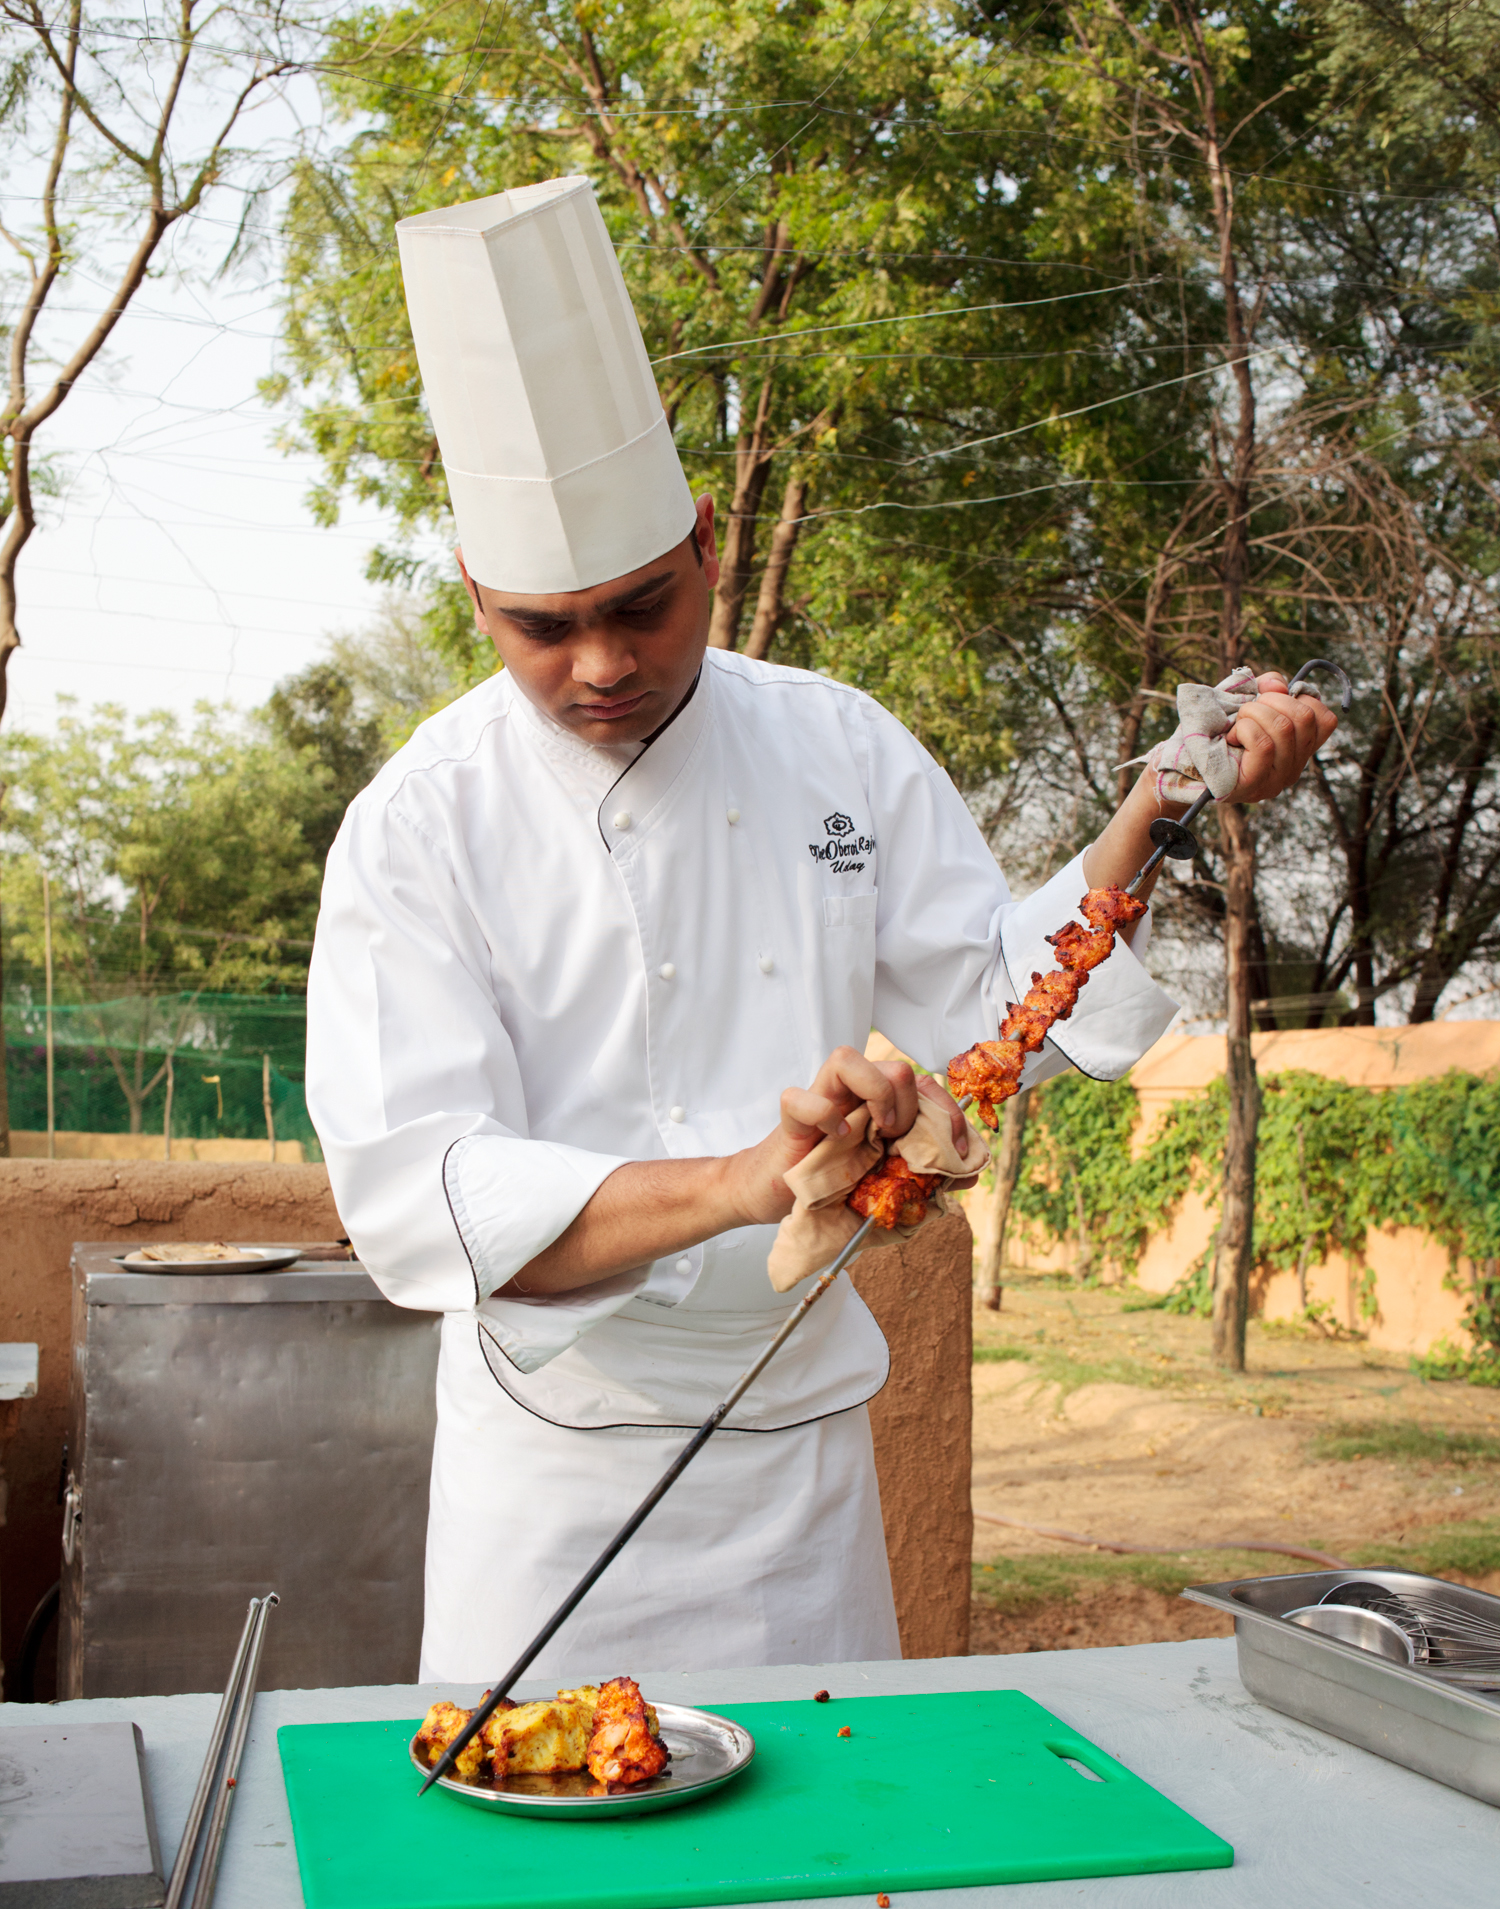 Jaipur, Rajasthan - Fish and chicken tikka kebabs in the herb garden kitchen at the Oberoi Rajvilas.  Singapore Airlines SilverKris